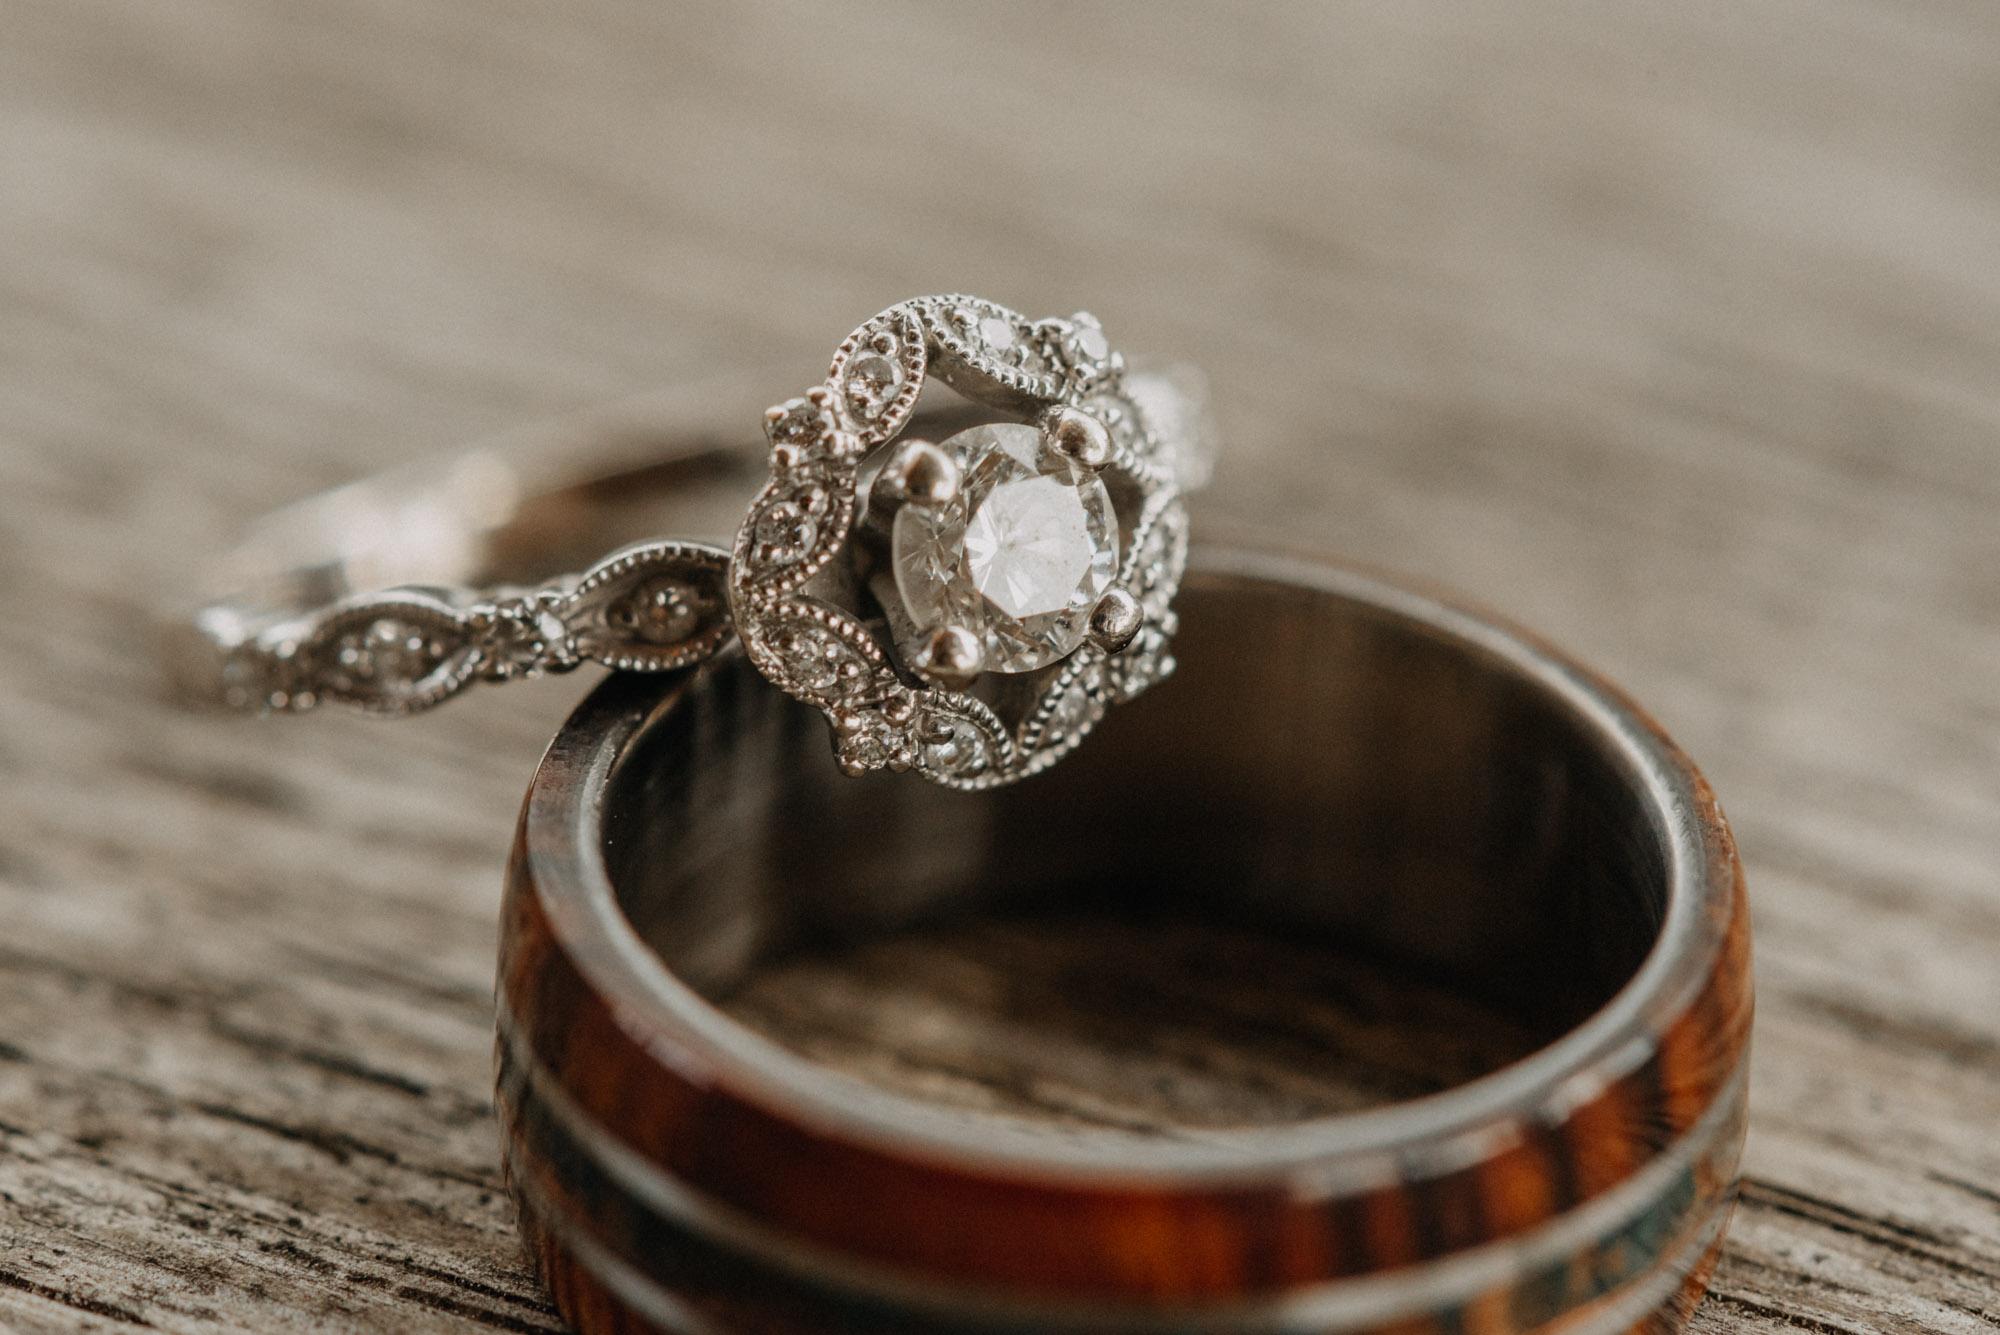 Getting-Ready-Swingset-Washington-Wedding-ringshot-7917.jpg